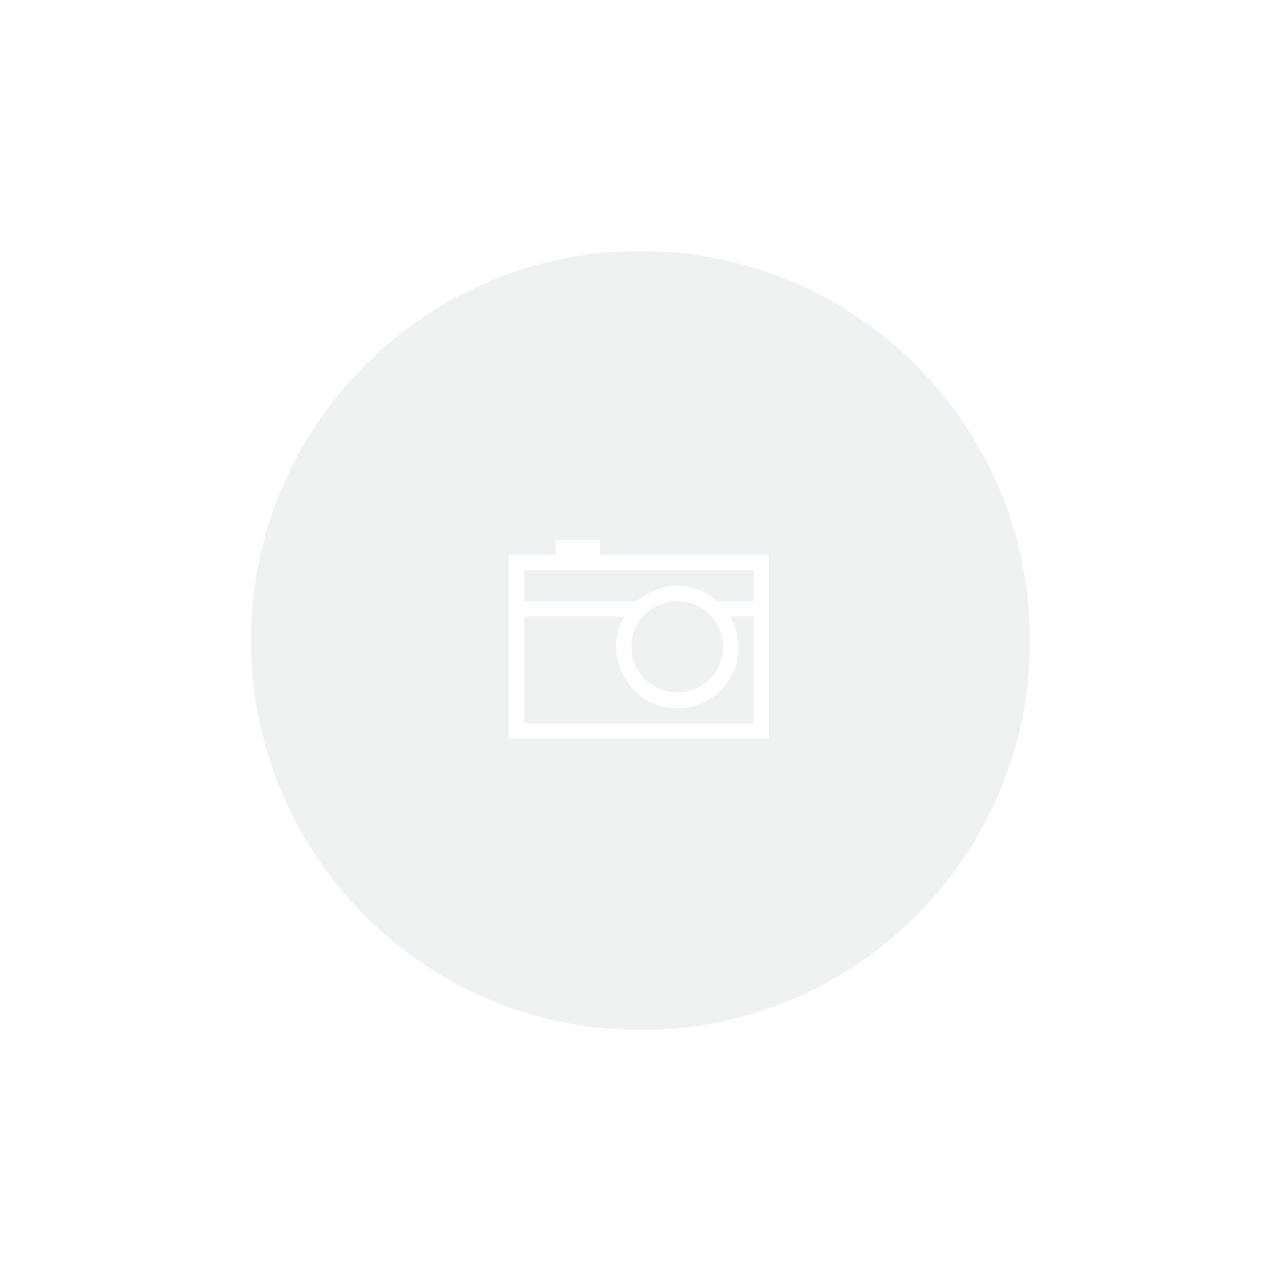 Placa de vídeo GeForce RTX 2080 AMP 8GB GDDR6 B256 BITS ZT-T20800D-10P